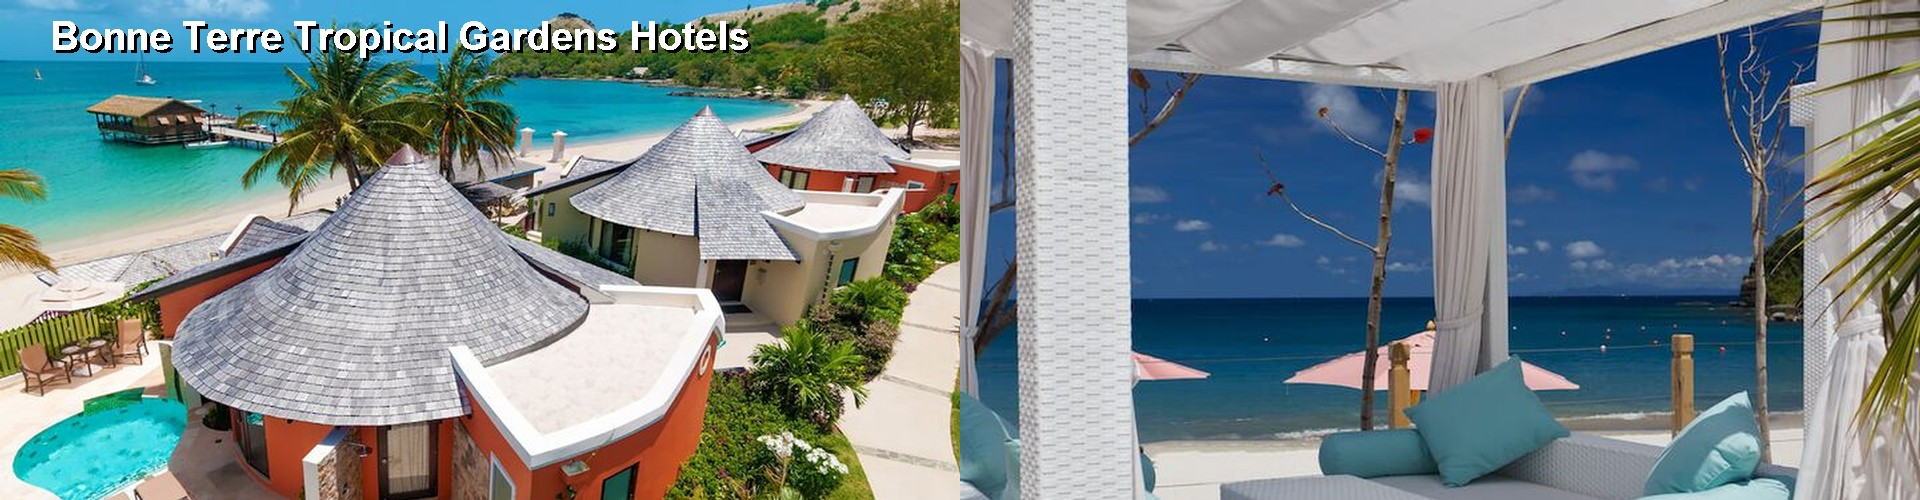 Hotels Near Bonne Terre Tropical Gardens in Gros Islet